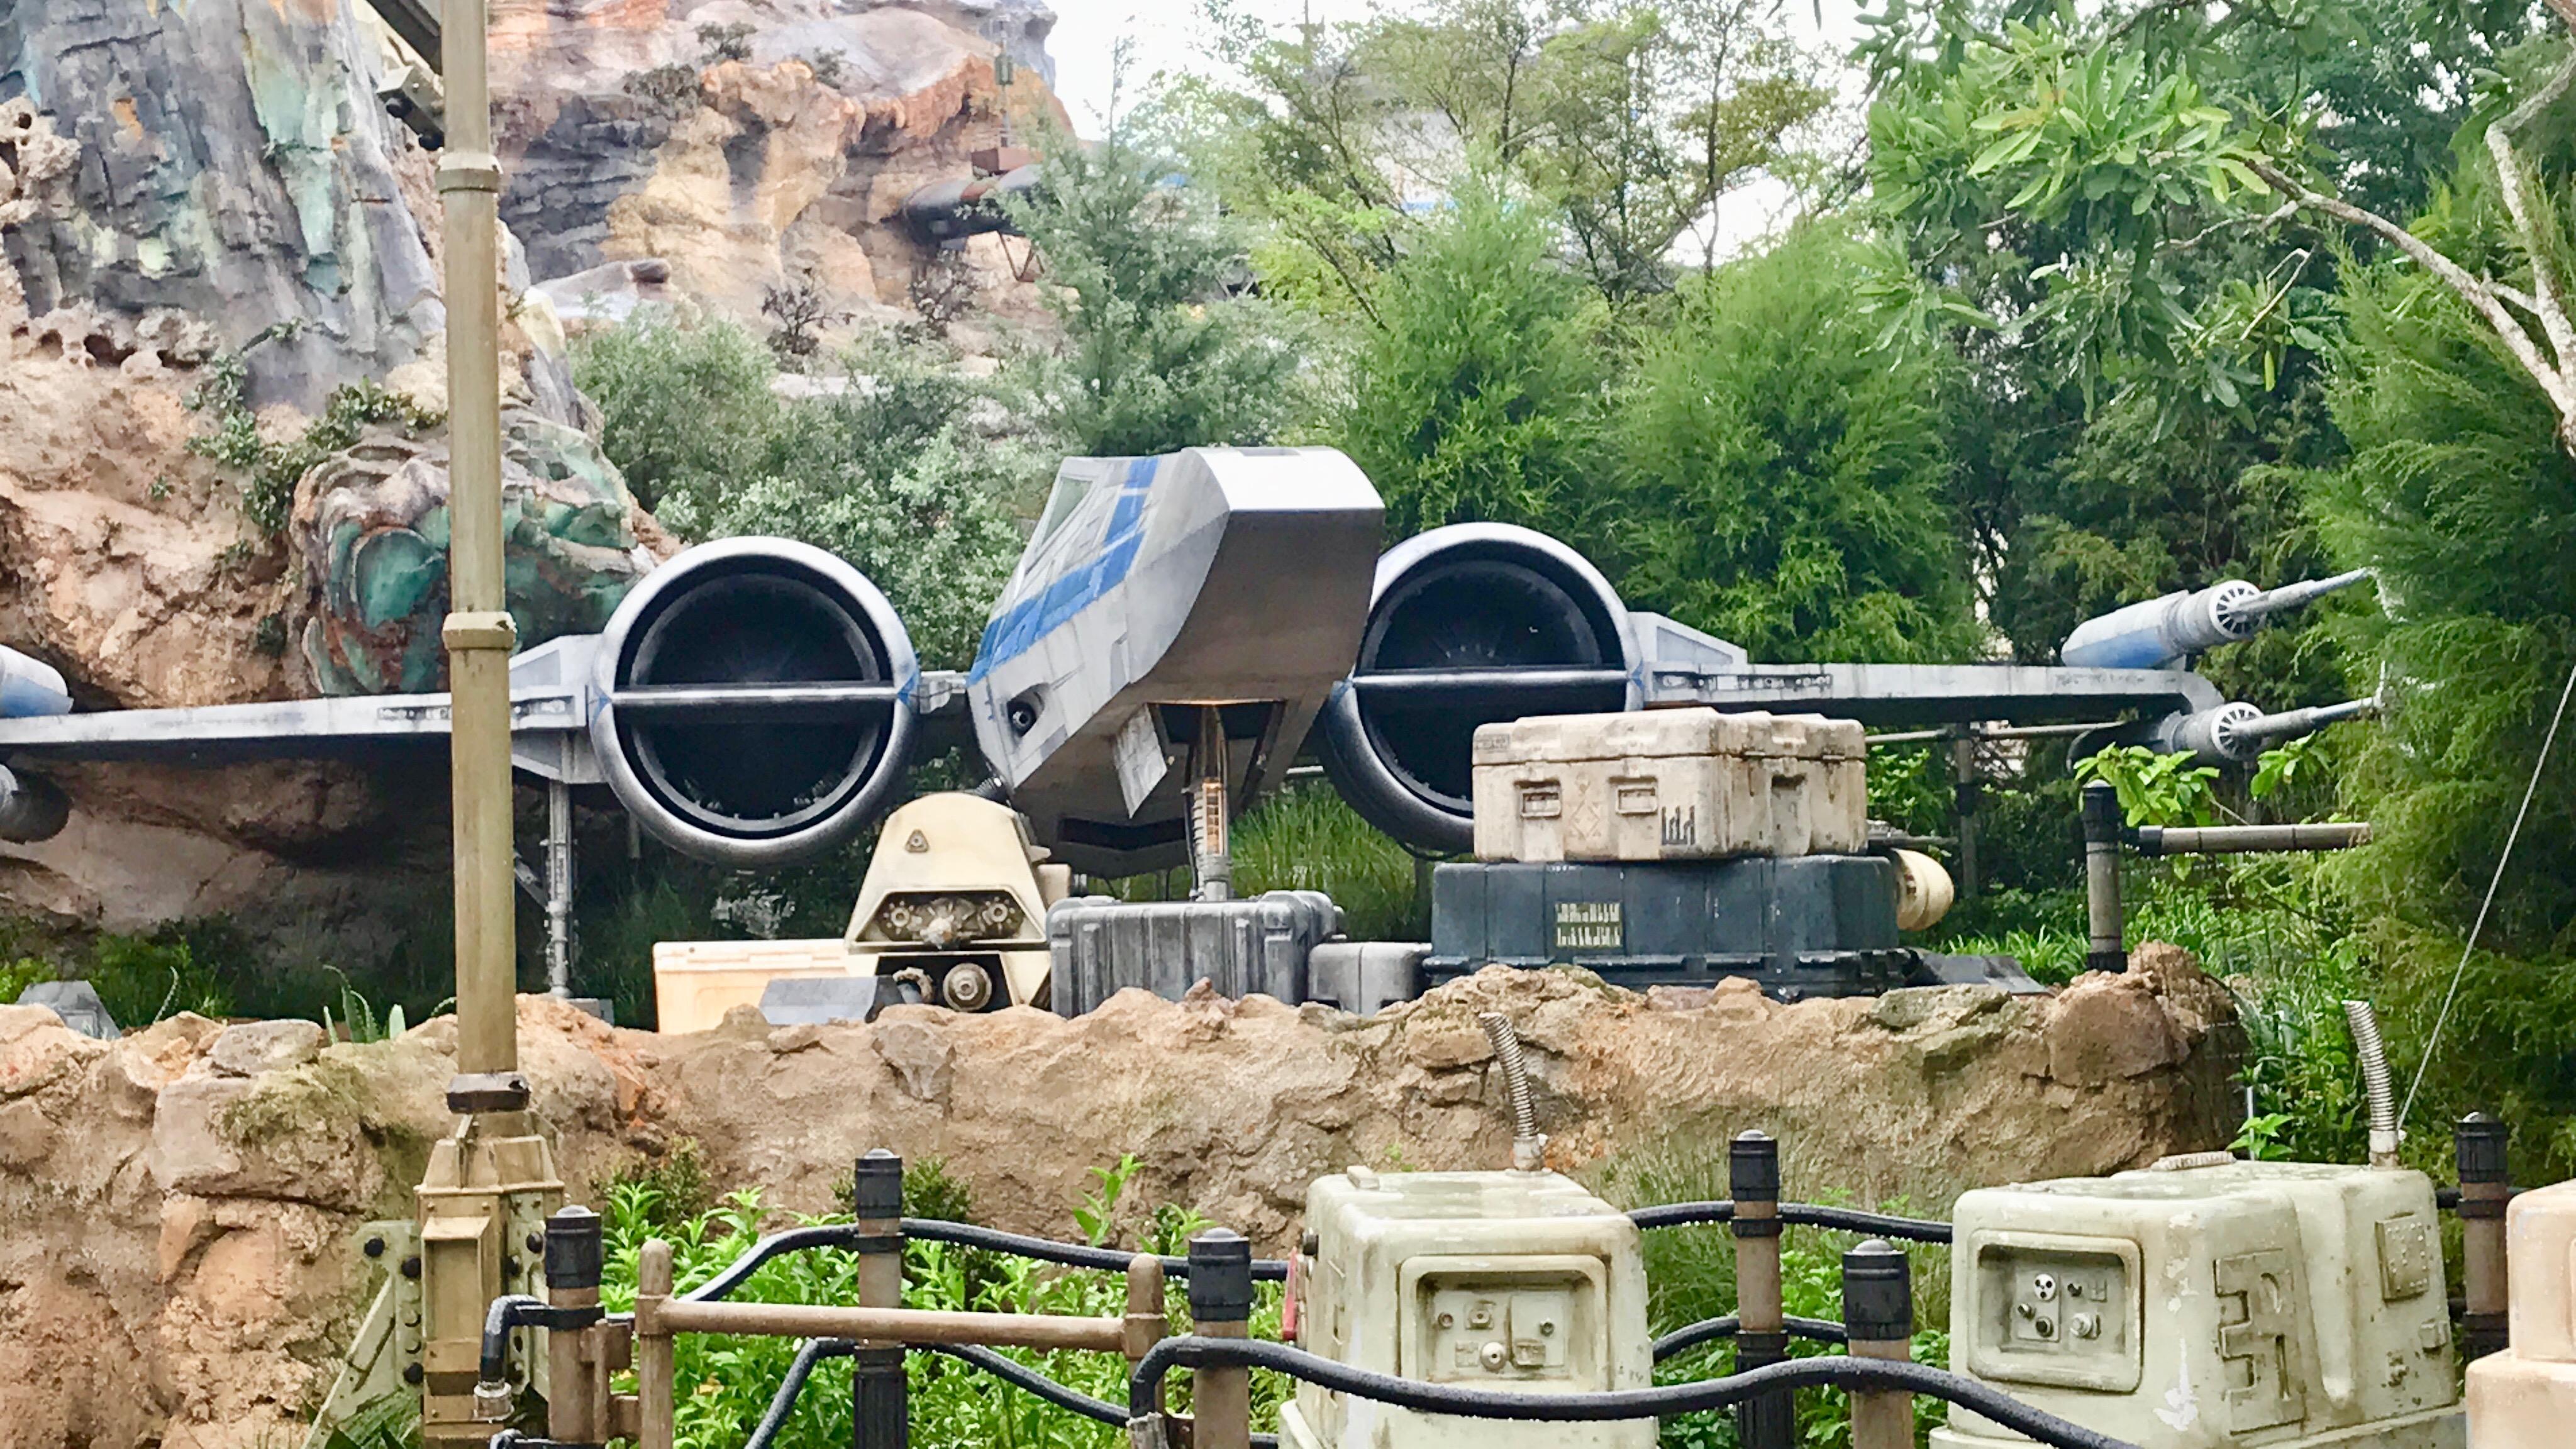 Star Wars Land Fighter ship